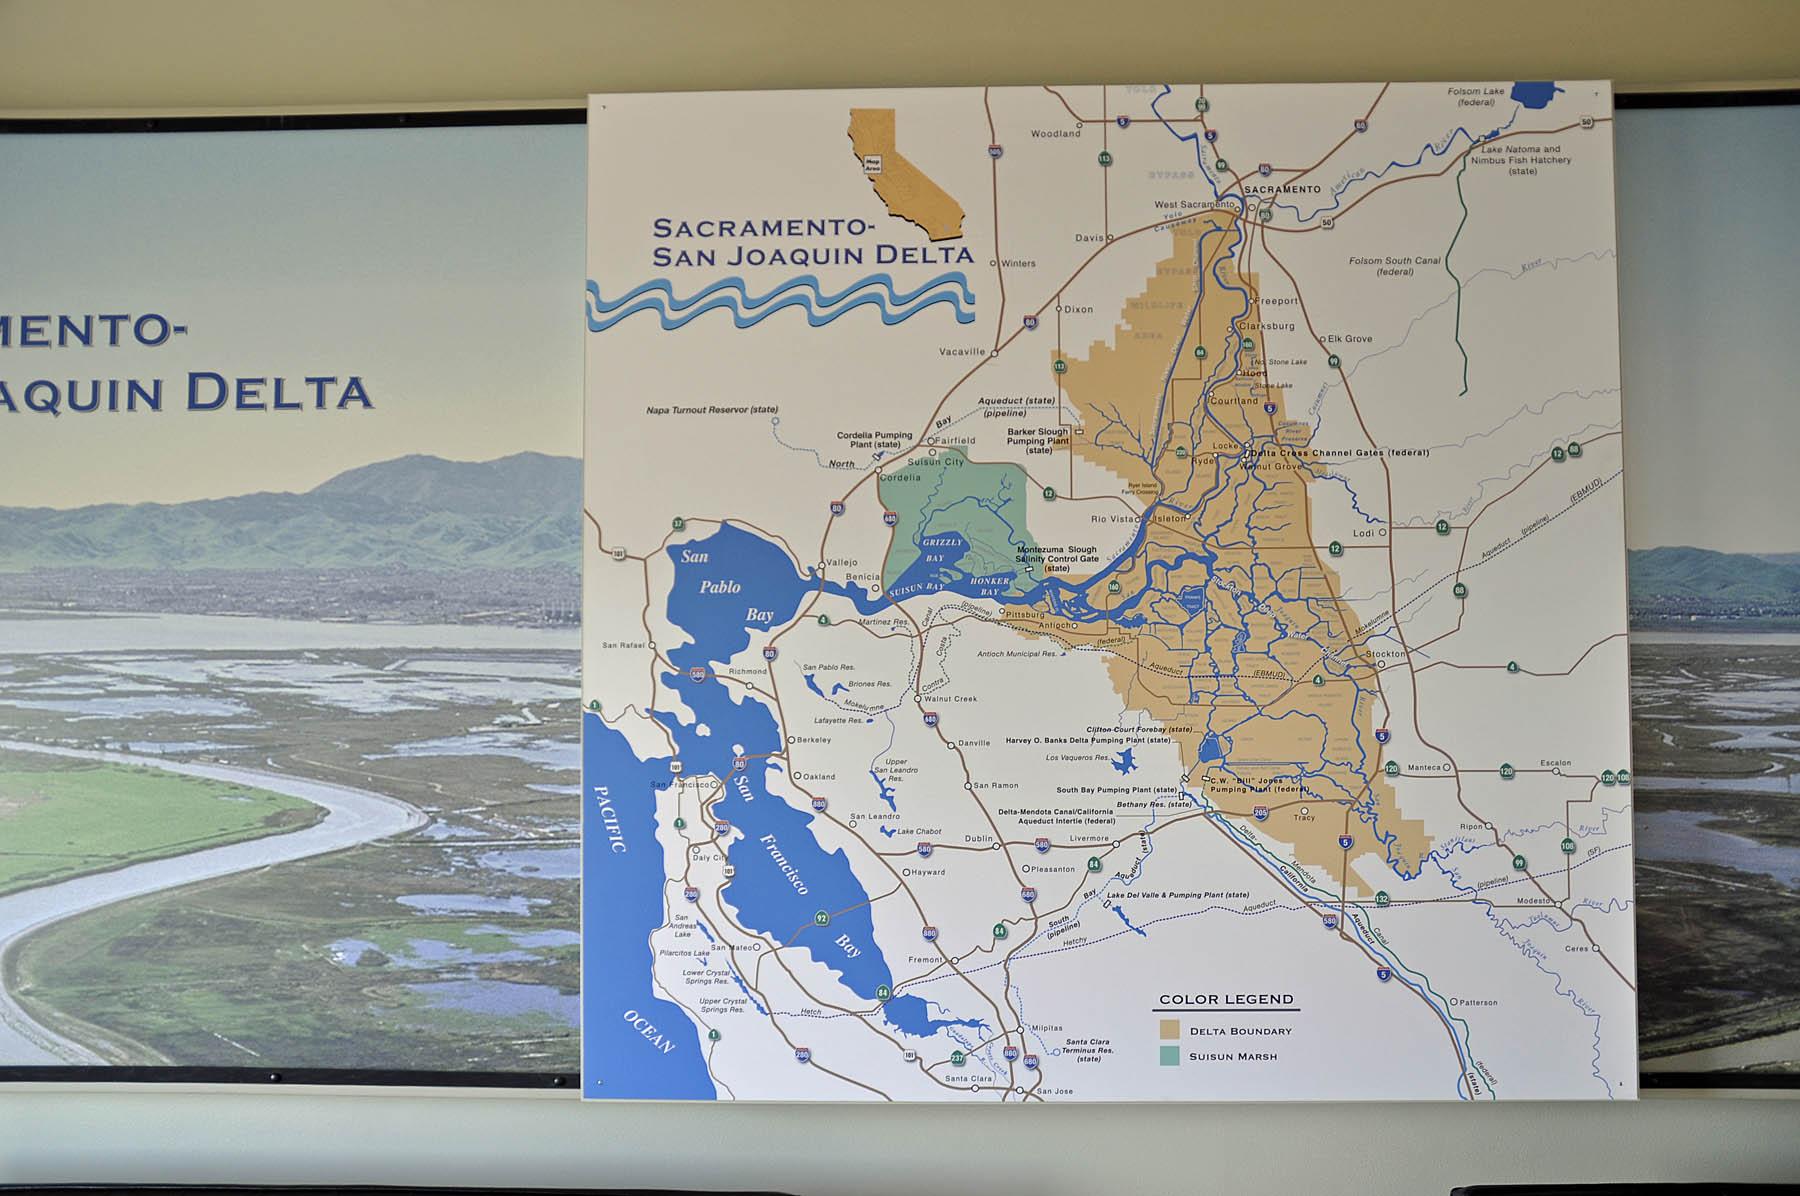 San Diego regional water news roundup Jul 22 28 2013 GrokSurf s